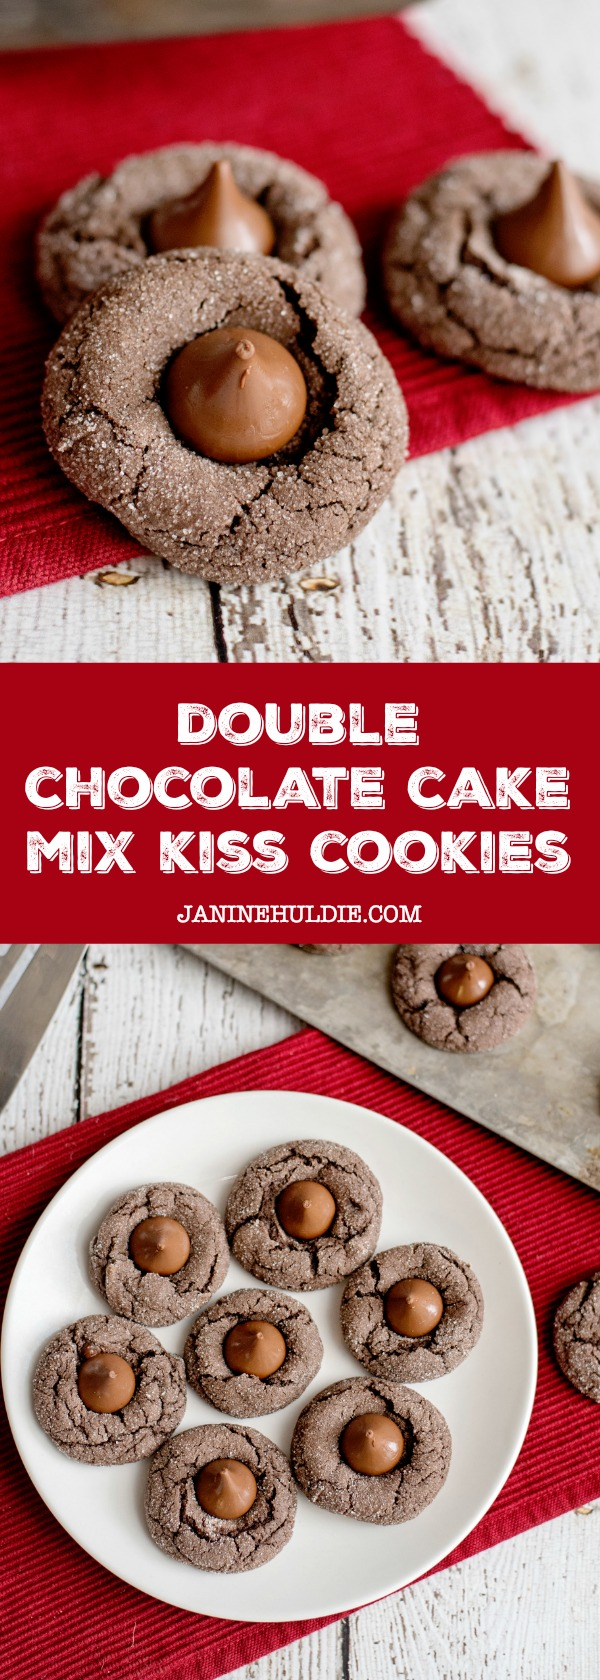 Double Chocolate Cake Mix Kiss Cookies Recipe